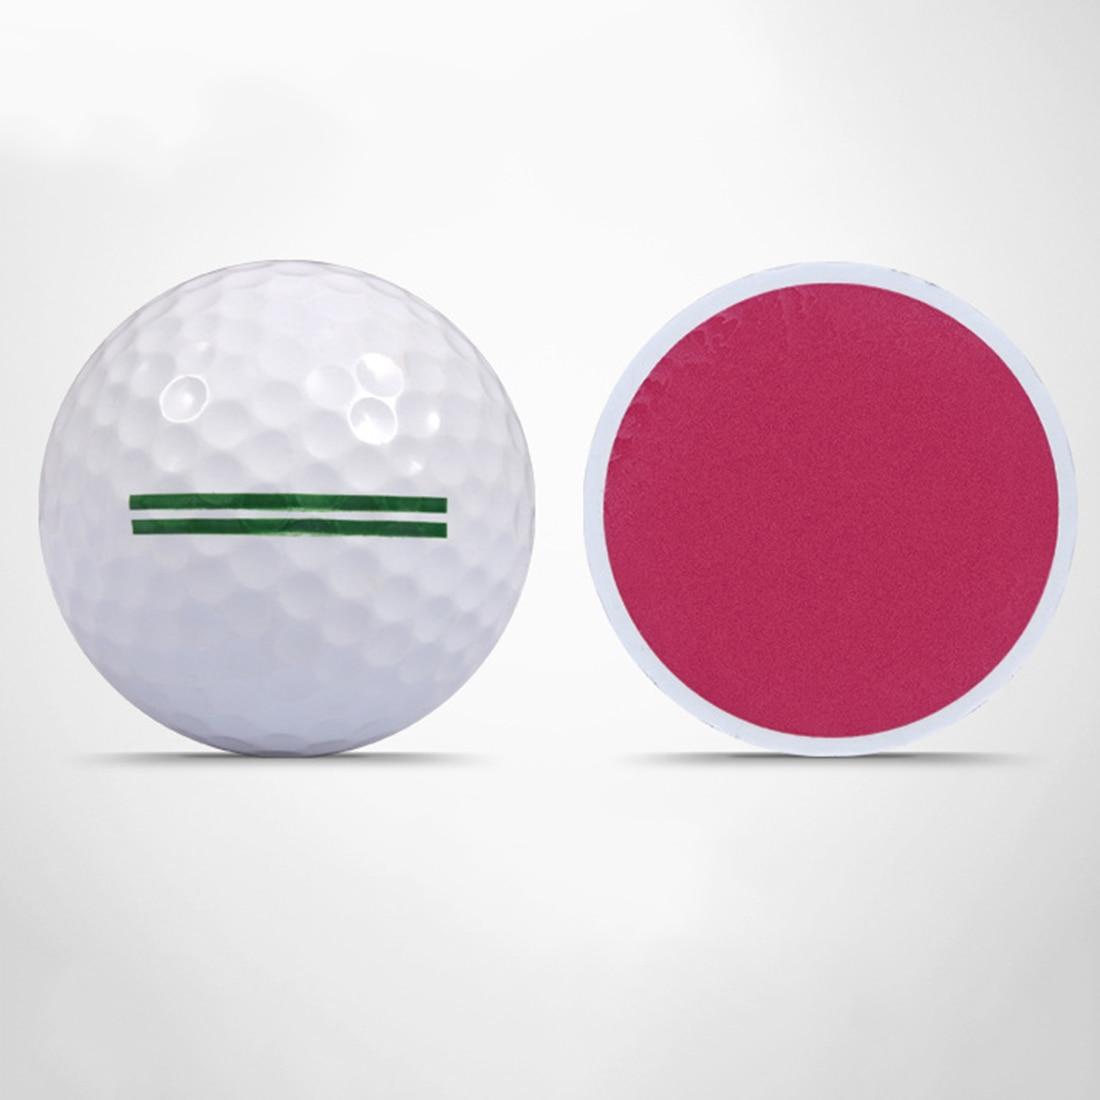 Light Weight Golf Balls Synthetic rubber sarin Supplies Kit 5pcs Outdoor